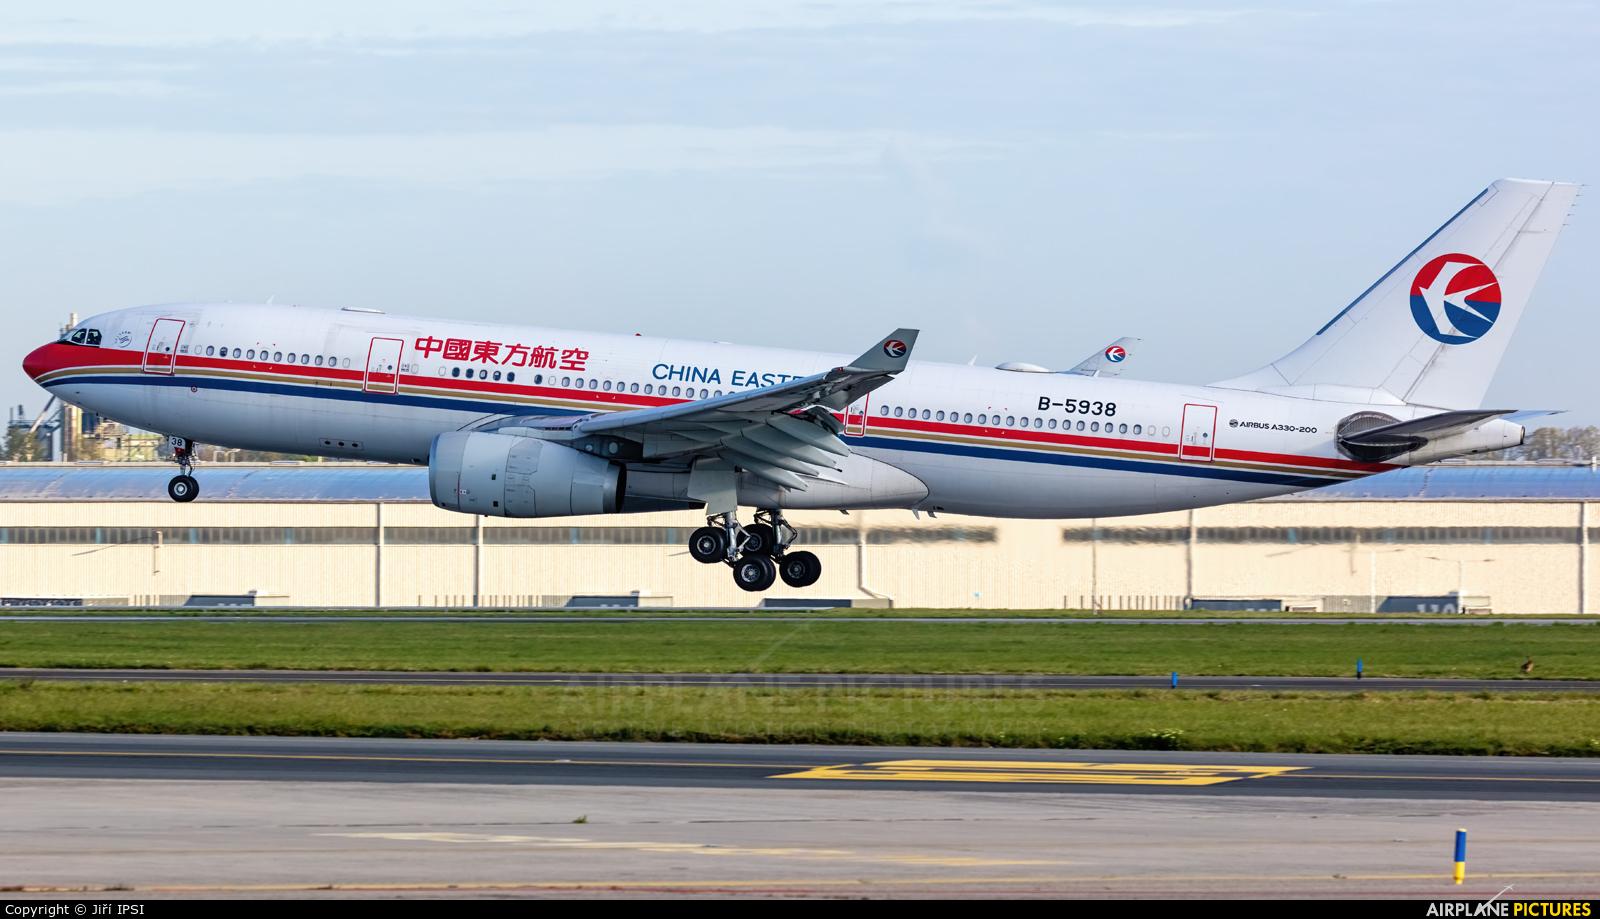 China Eastern Airlines B-5938 aircraft at Prague - Václav Havel